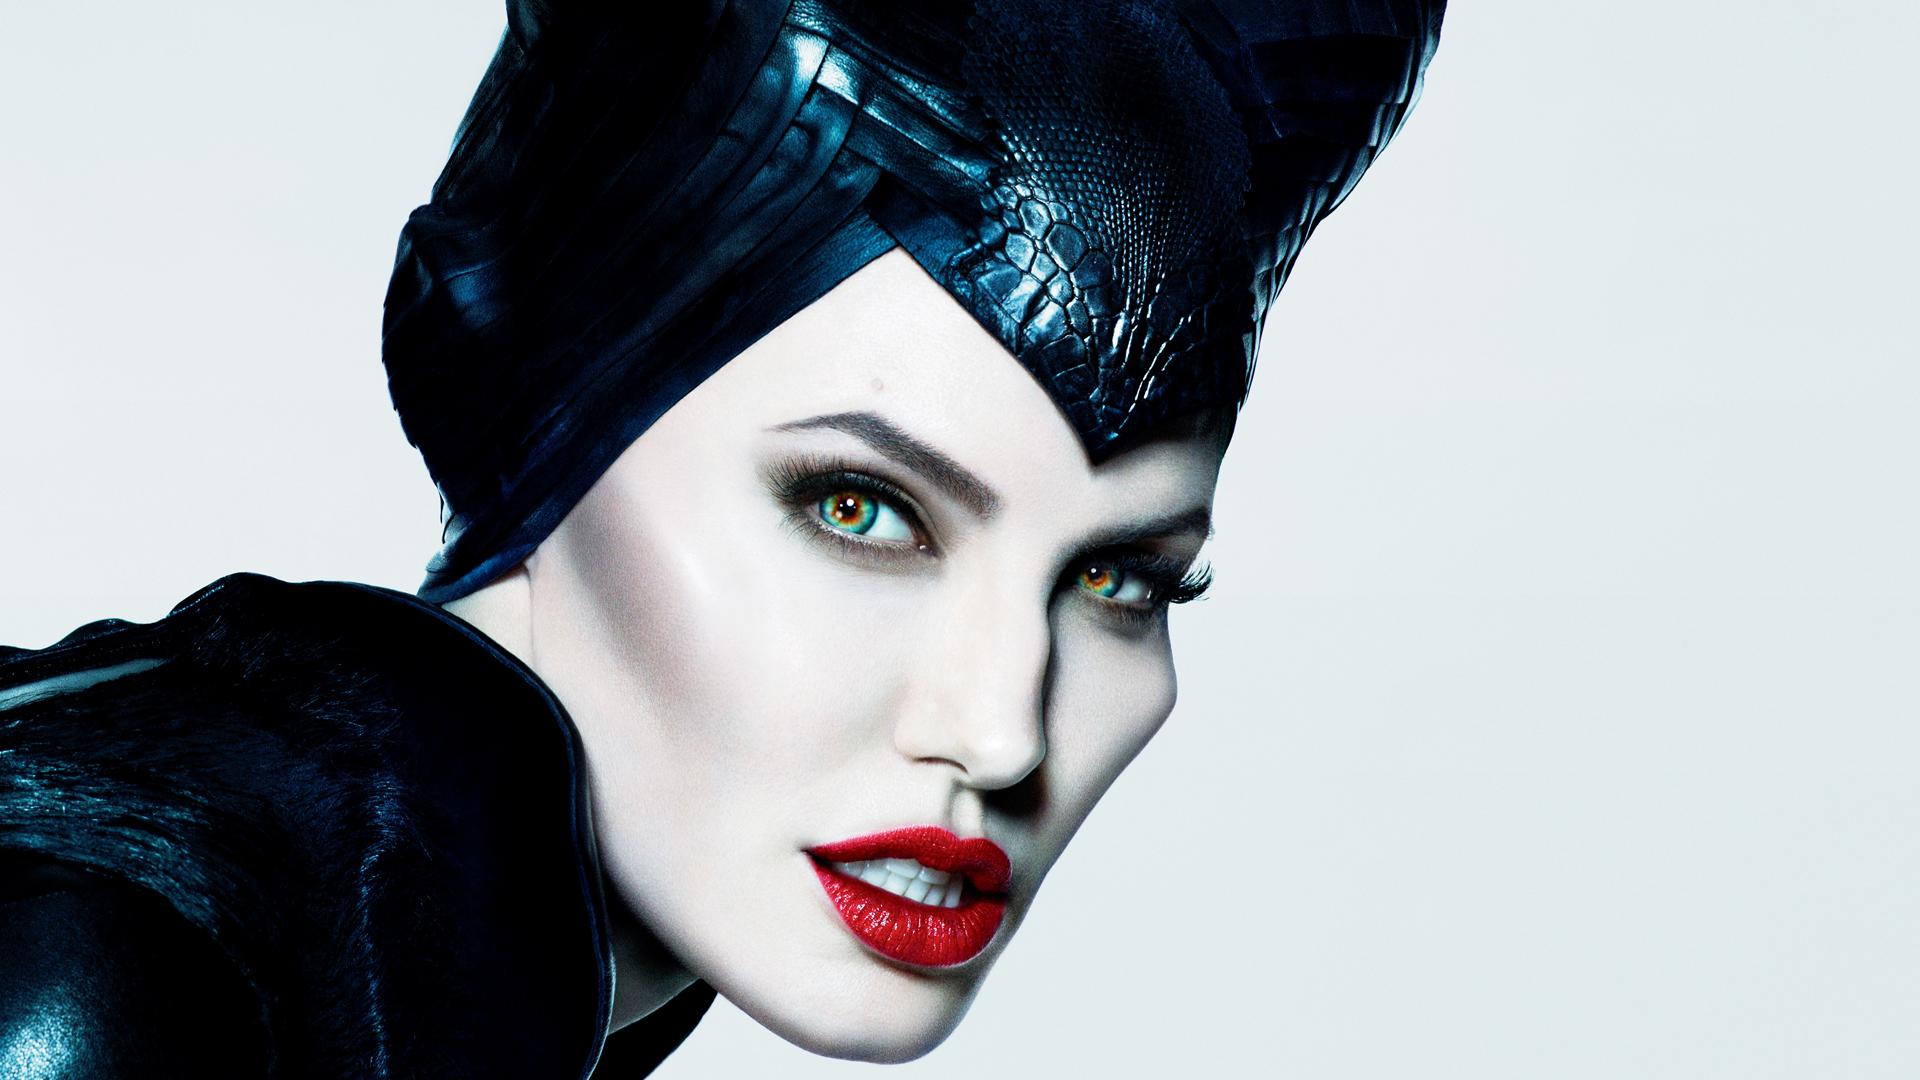 maleficent-2014-angelina-jolie-movie-1920x1080